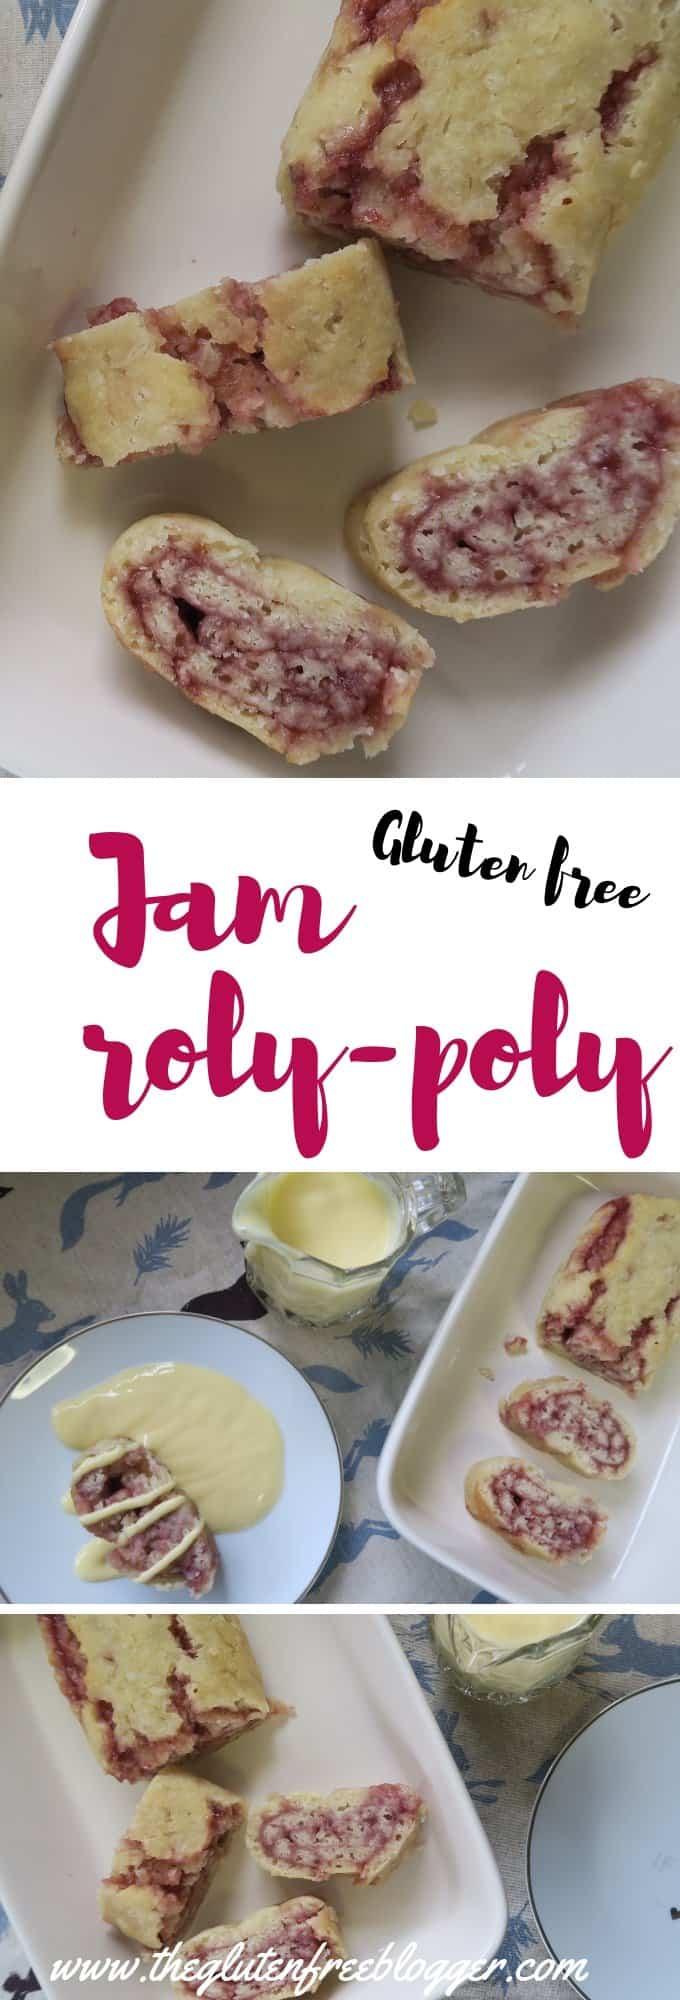 gluten free jam roly poly recipe - dairy free - gluten free dessert - pudding recipe